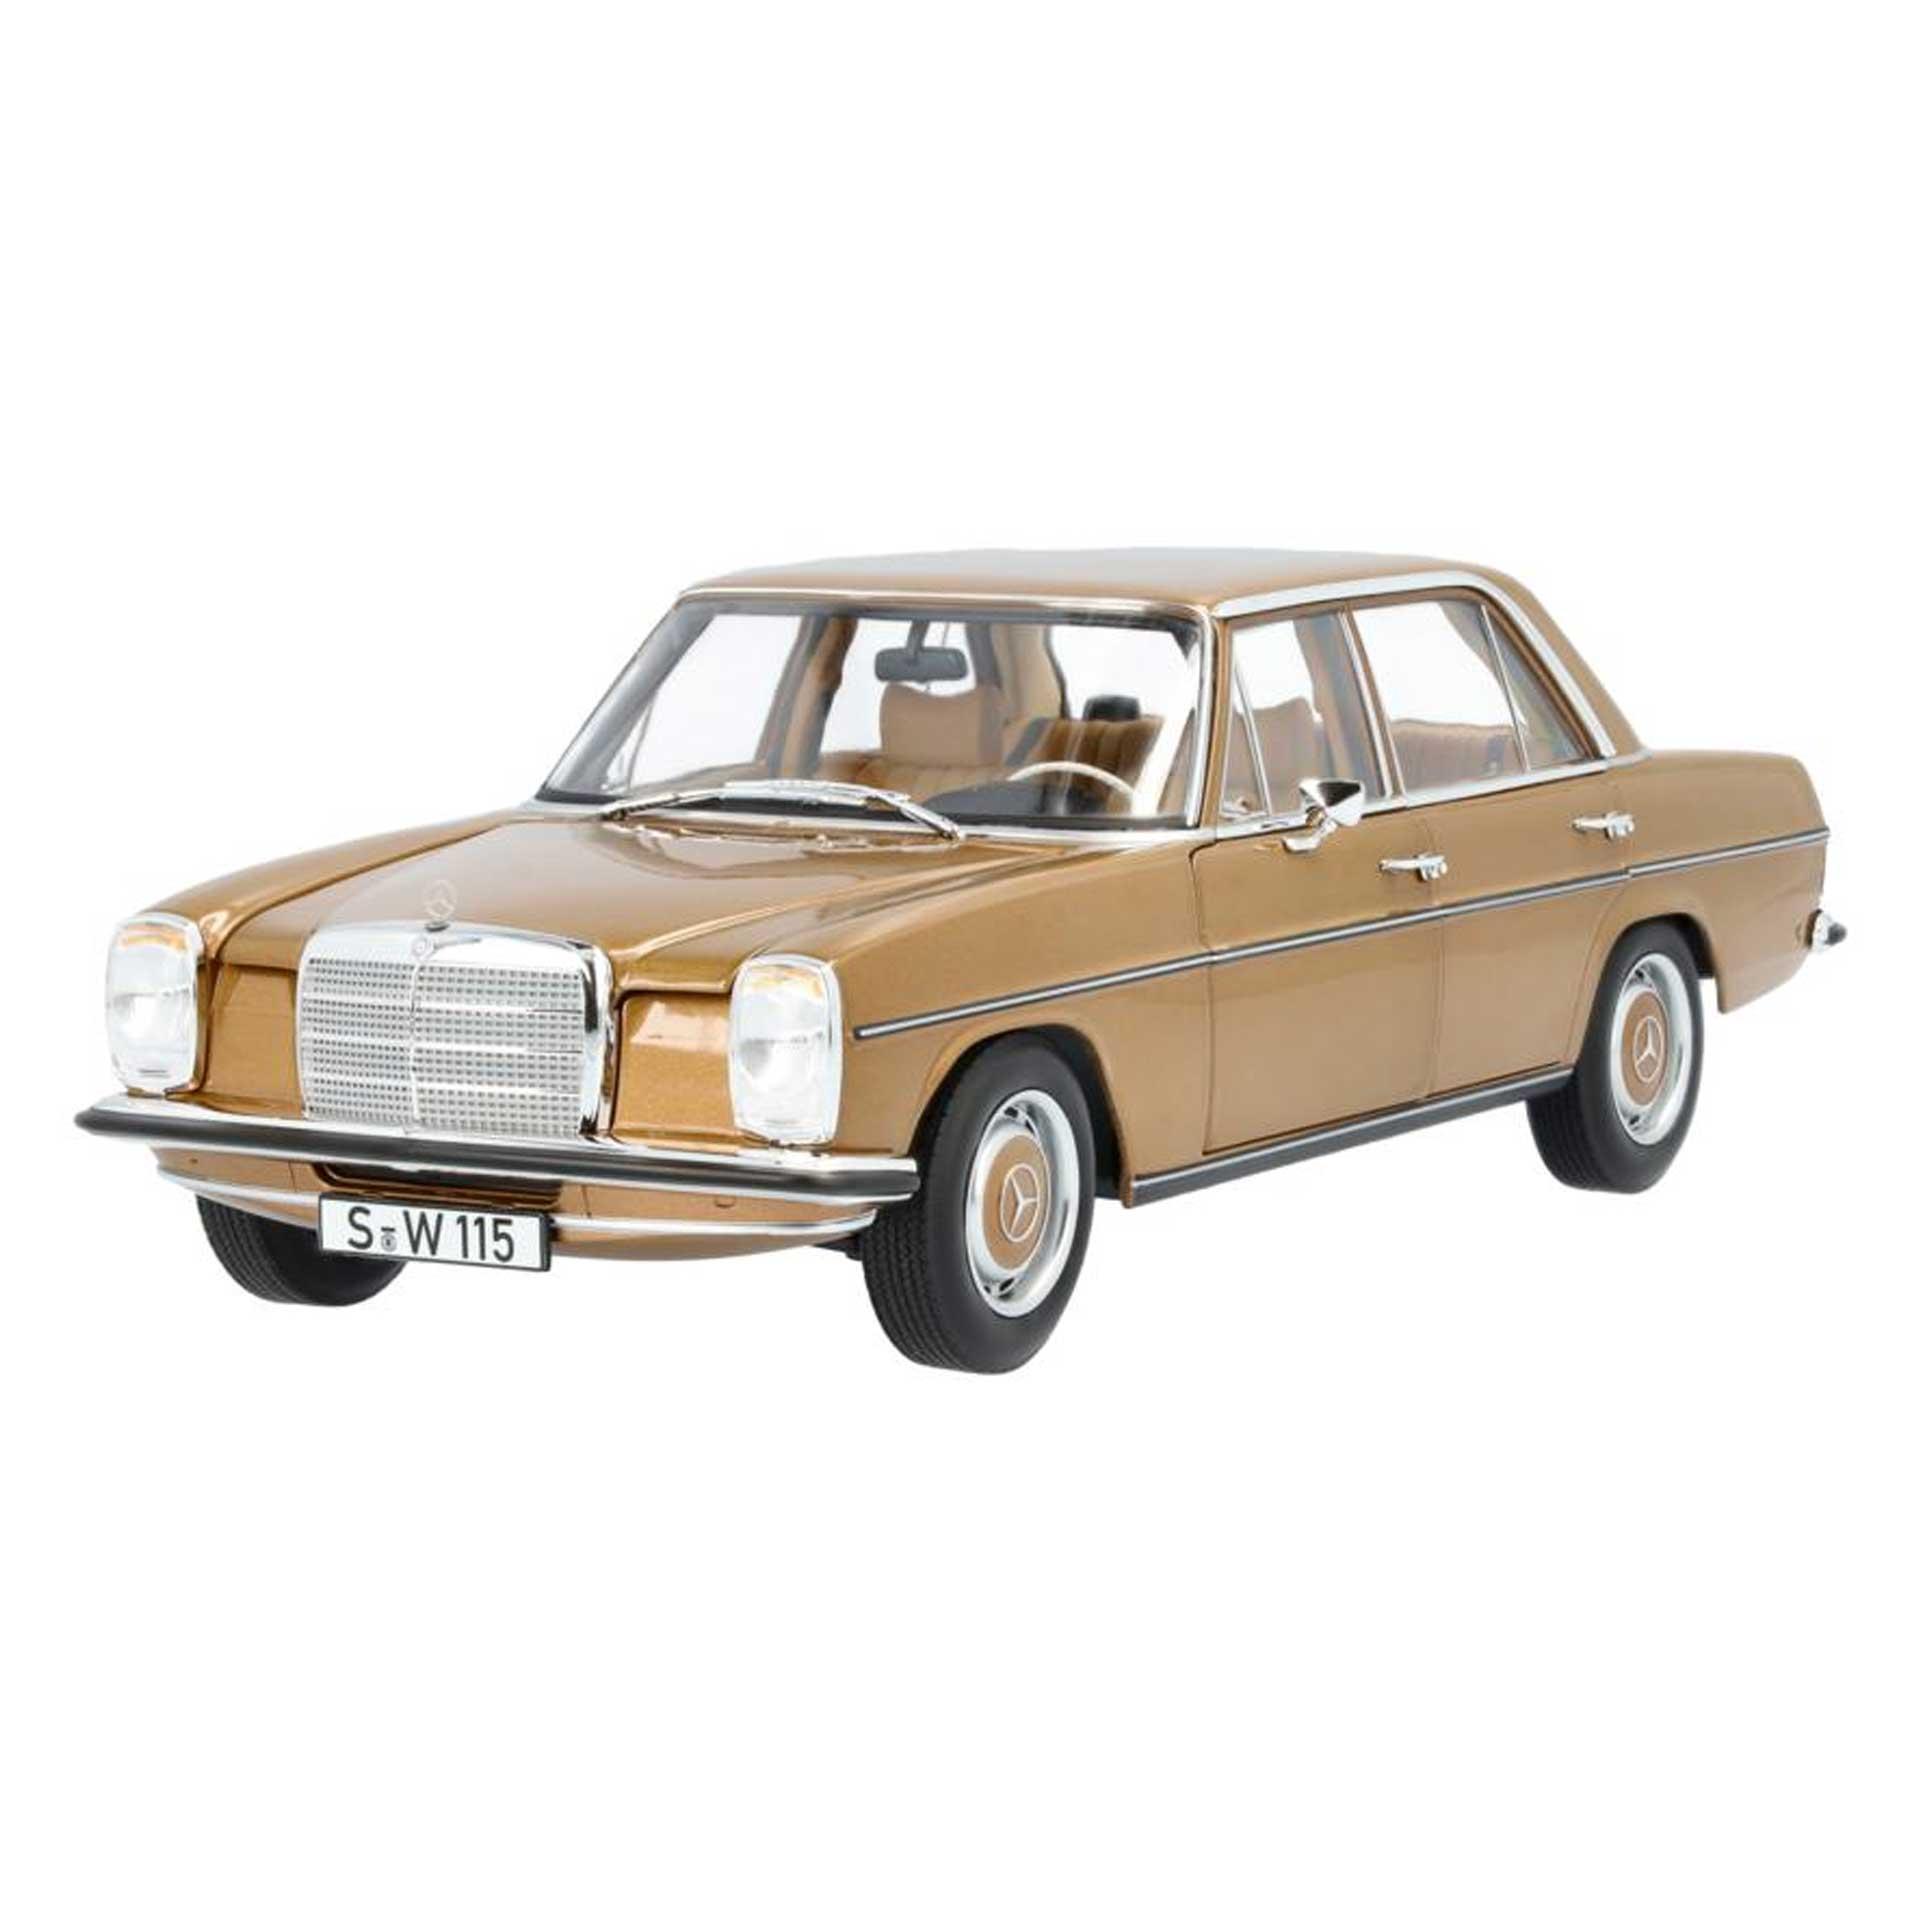 Mercedes-Benz Modellauto 200 /8 W114 W115 (1968-1973) 1:18